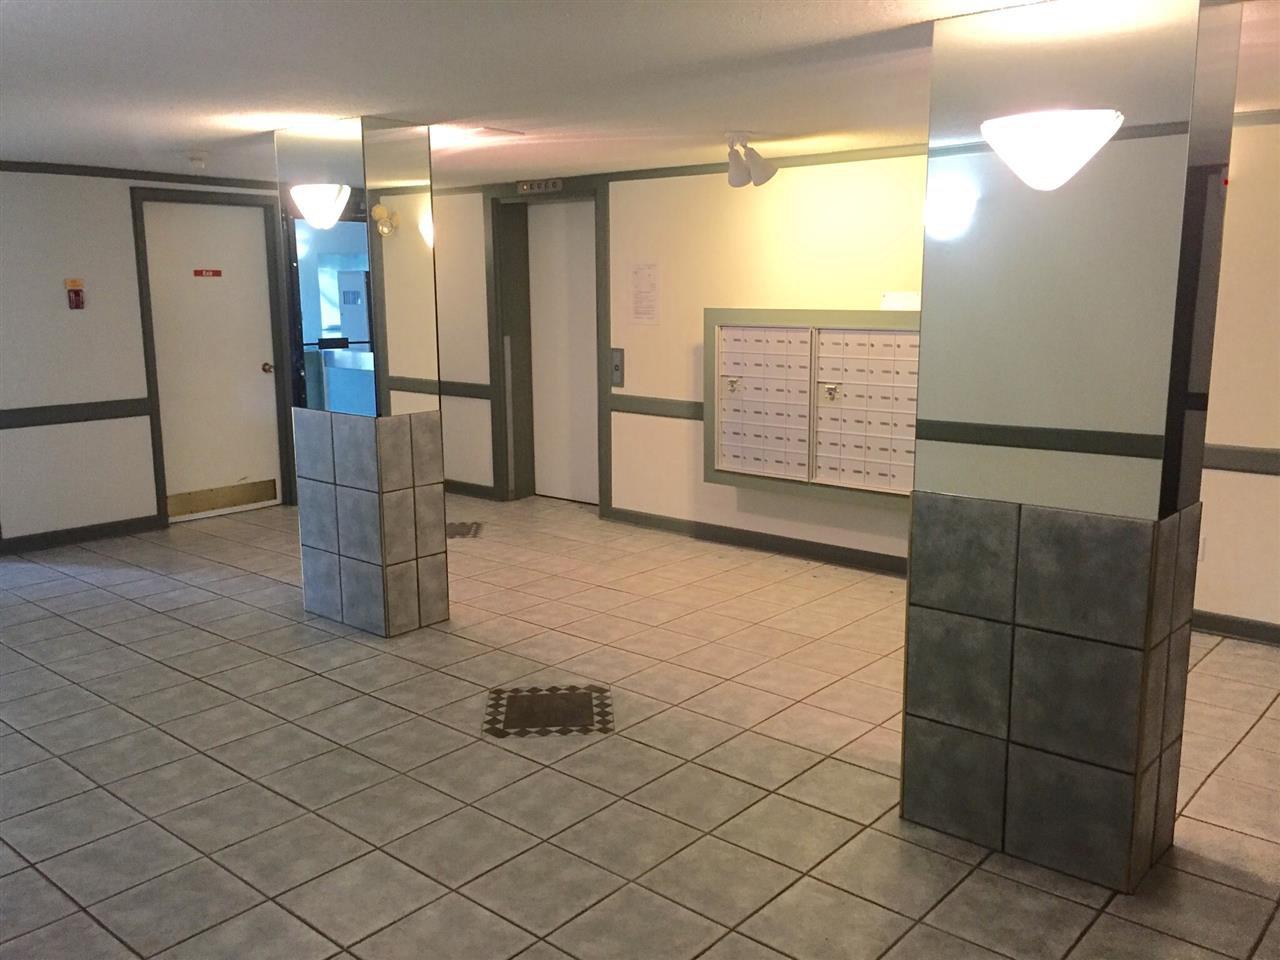 "Main Photo: 2202 13819 100 Avenue in Surrey: Whalley Condo for sale in ""CARRIAGE LANE ESTATES"" (North Surrey)  : MLS®# R2109301"